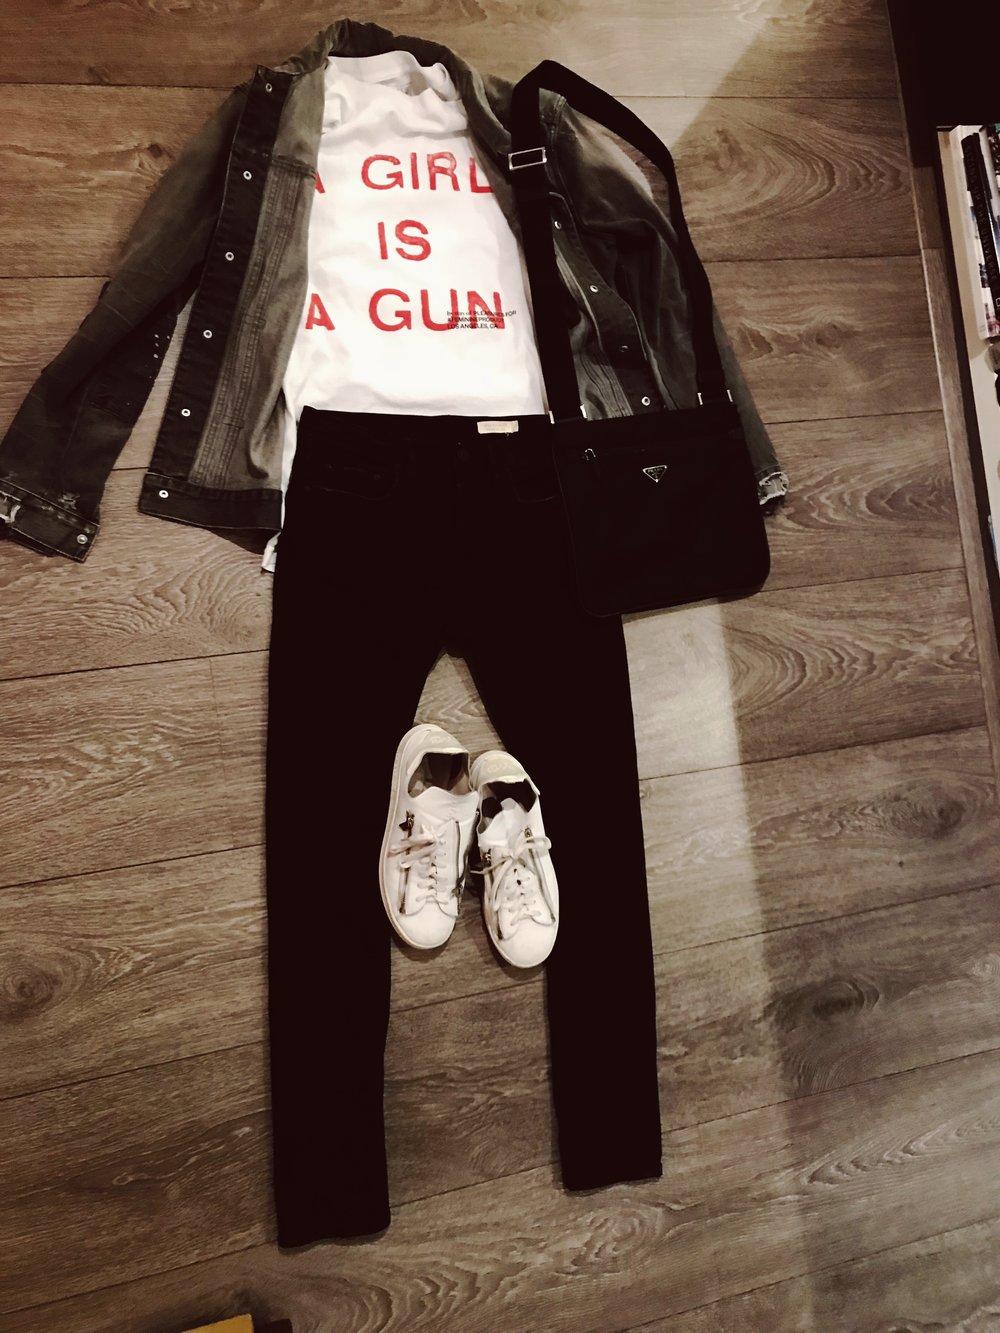 1. All Saints Denim Jacket  2. A Girl is a Gun Tshirt  3. Burberry Jeans  4. Y-3 Stan Zip Sneakers